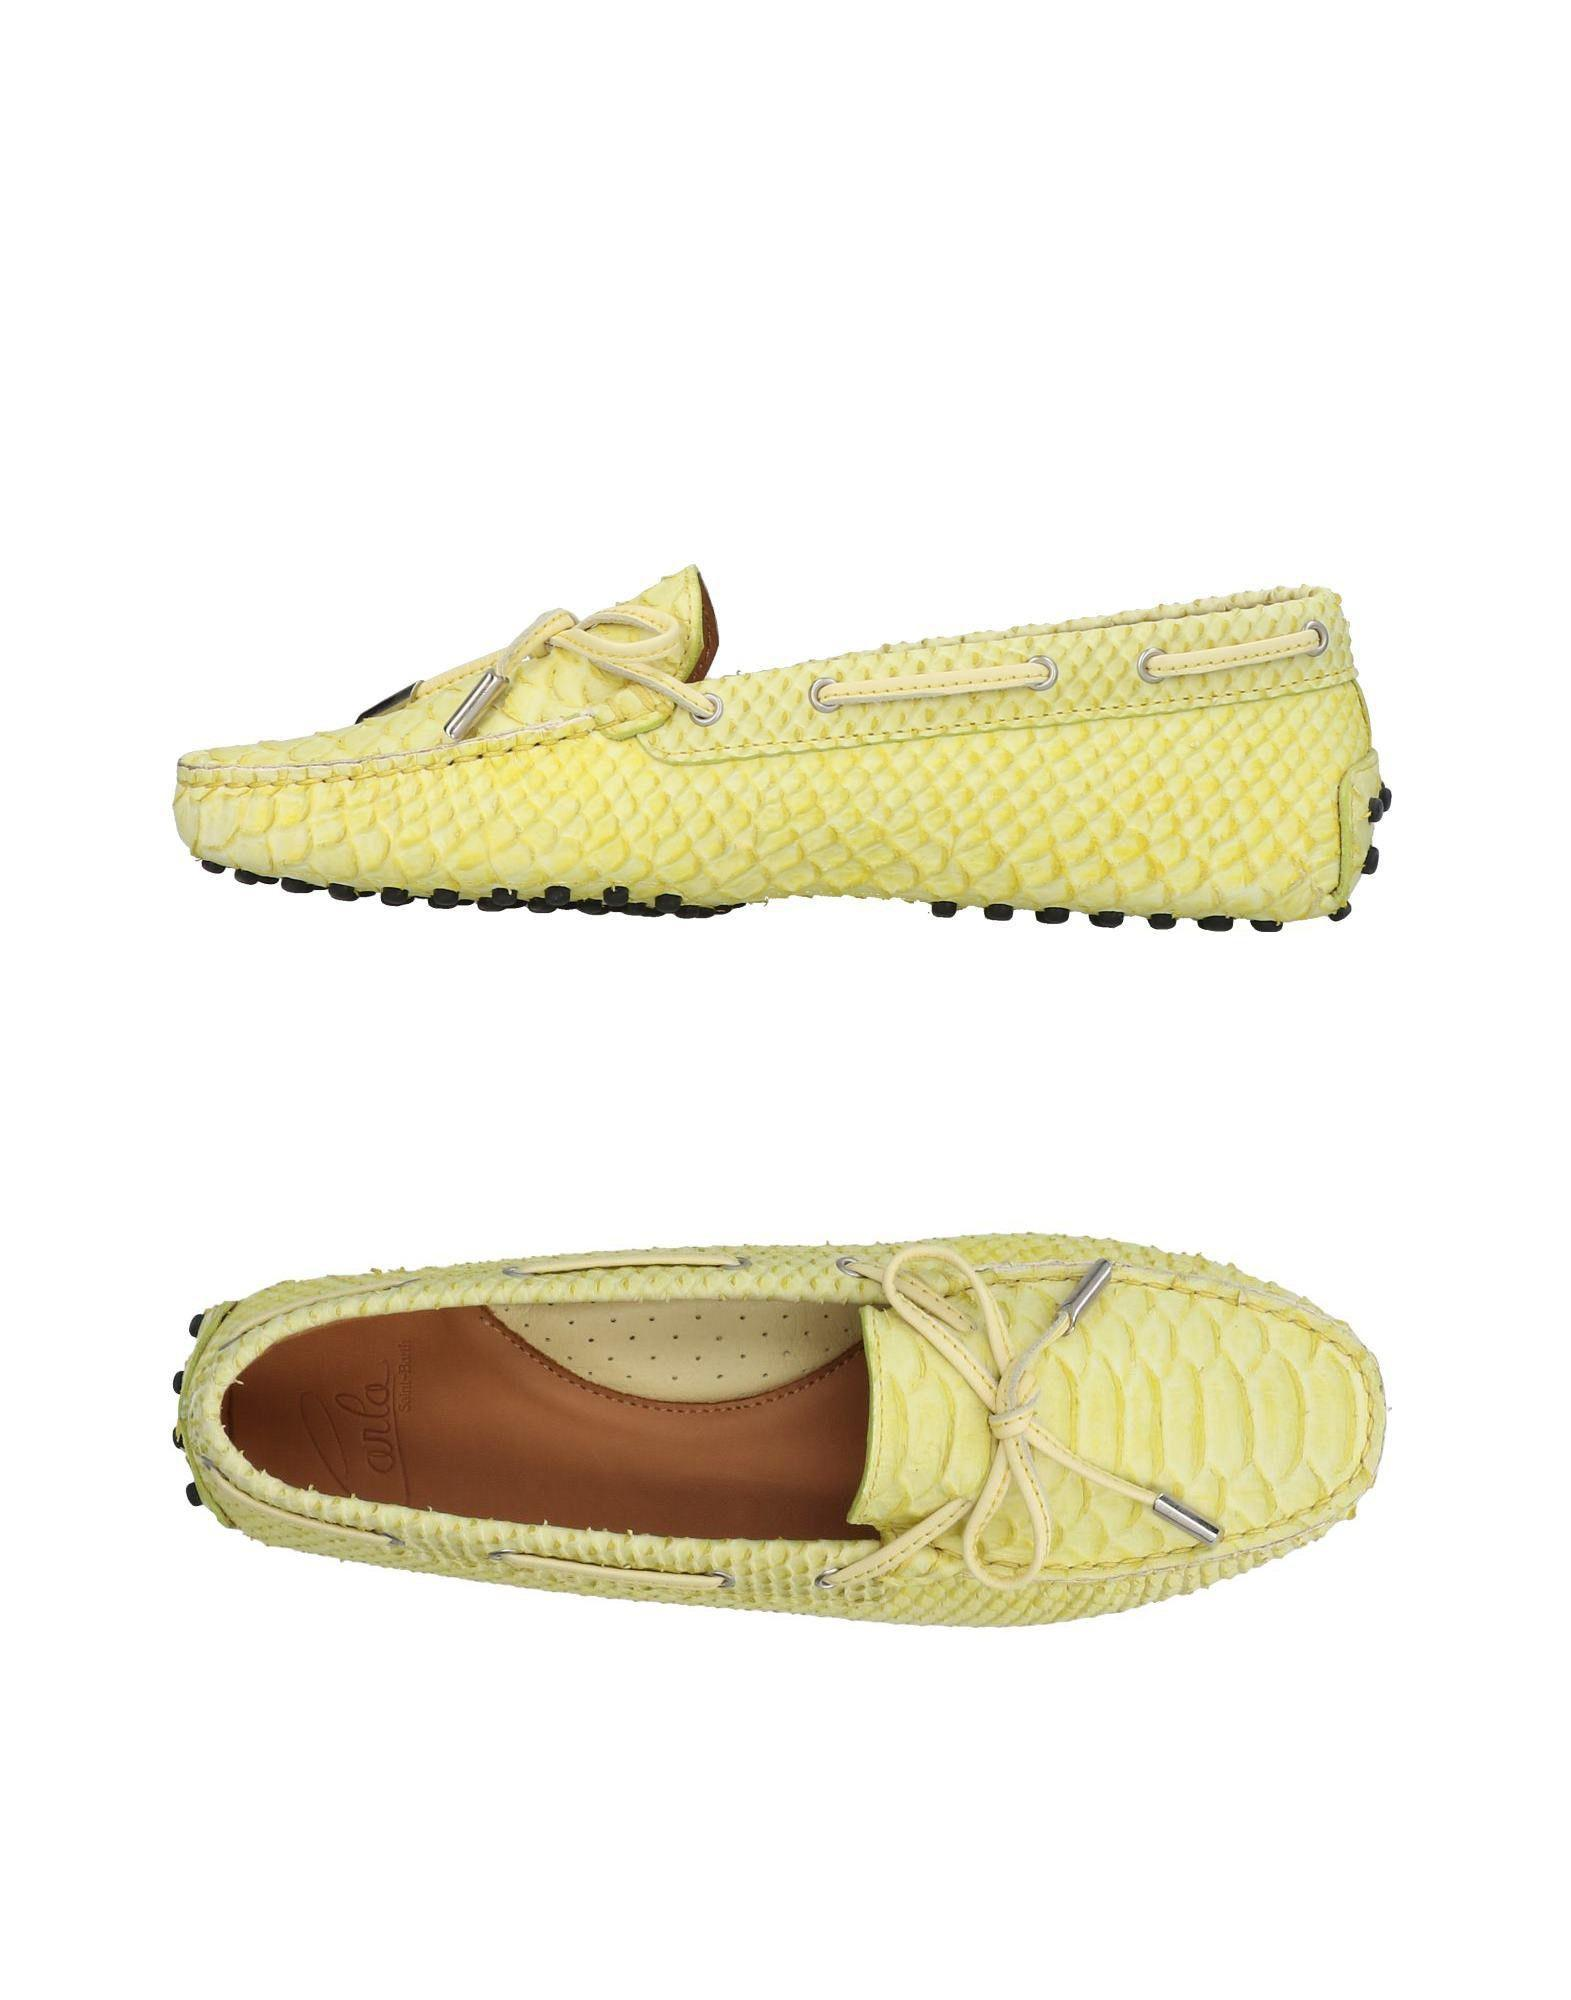 Chaussures - Sandales Entredoigt Carla Saint Barth VQjtn